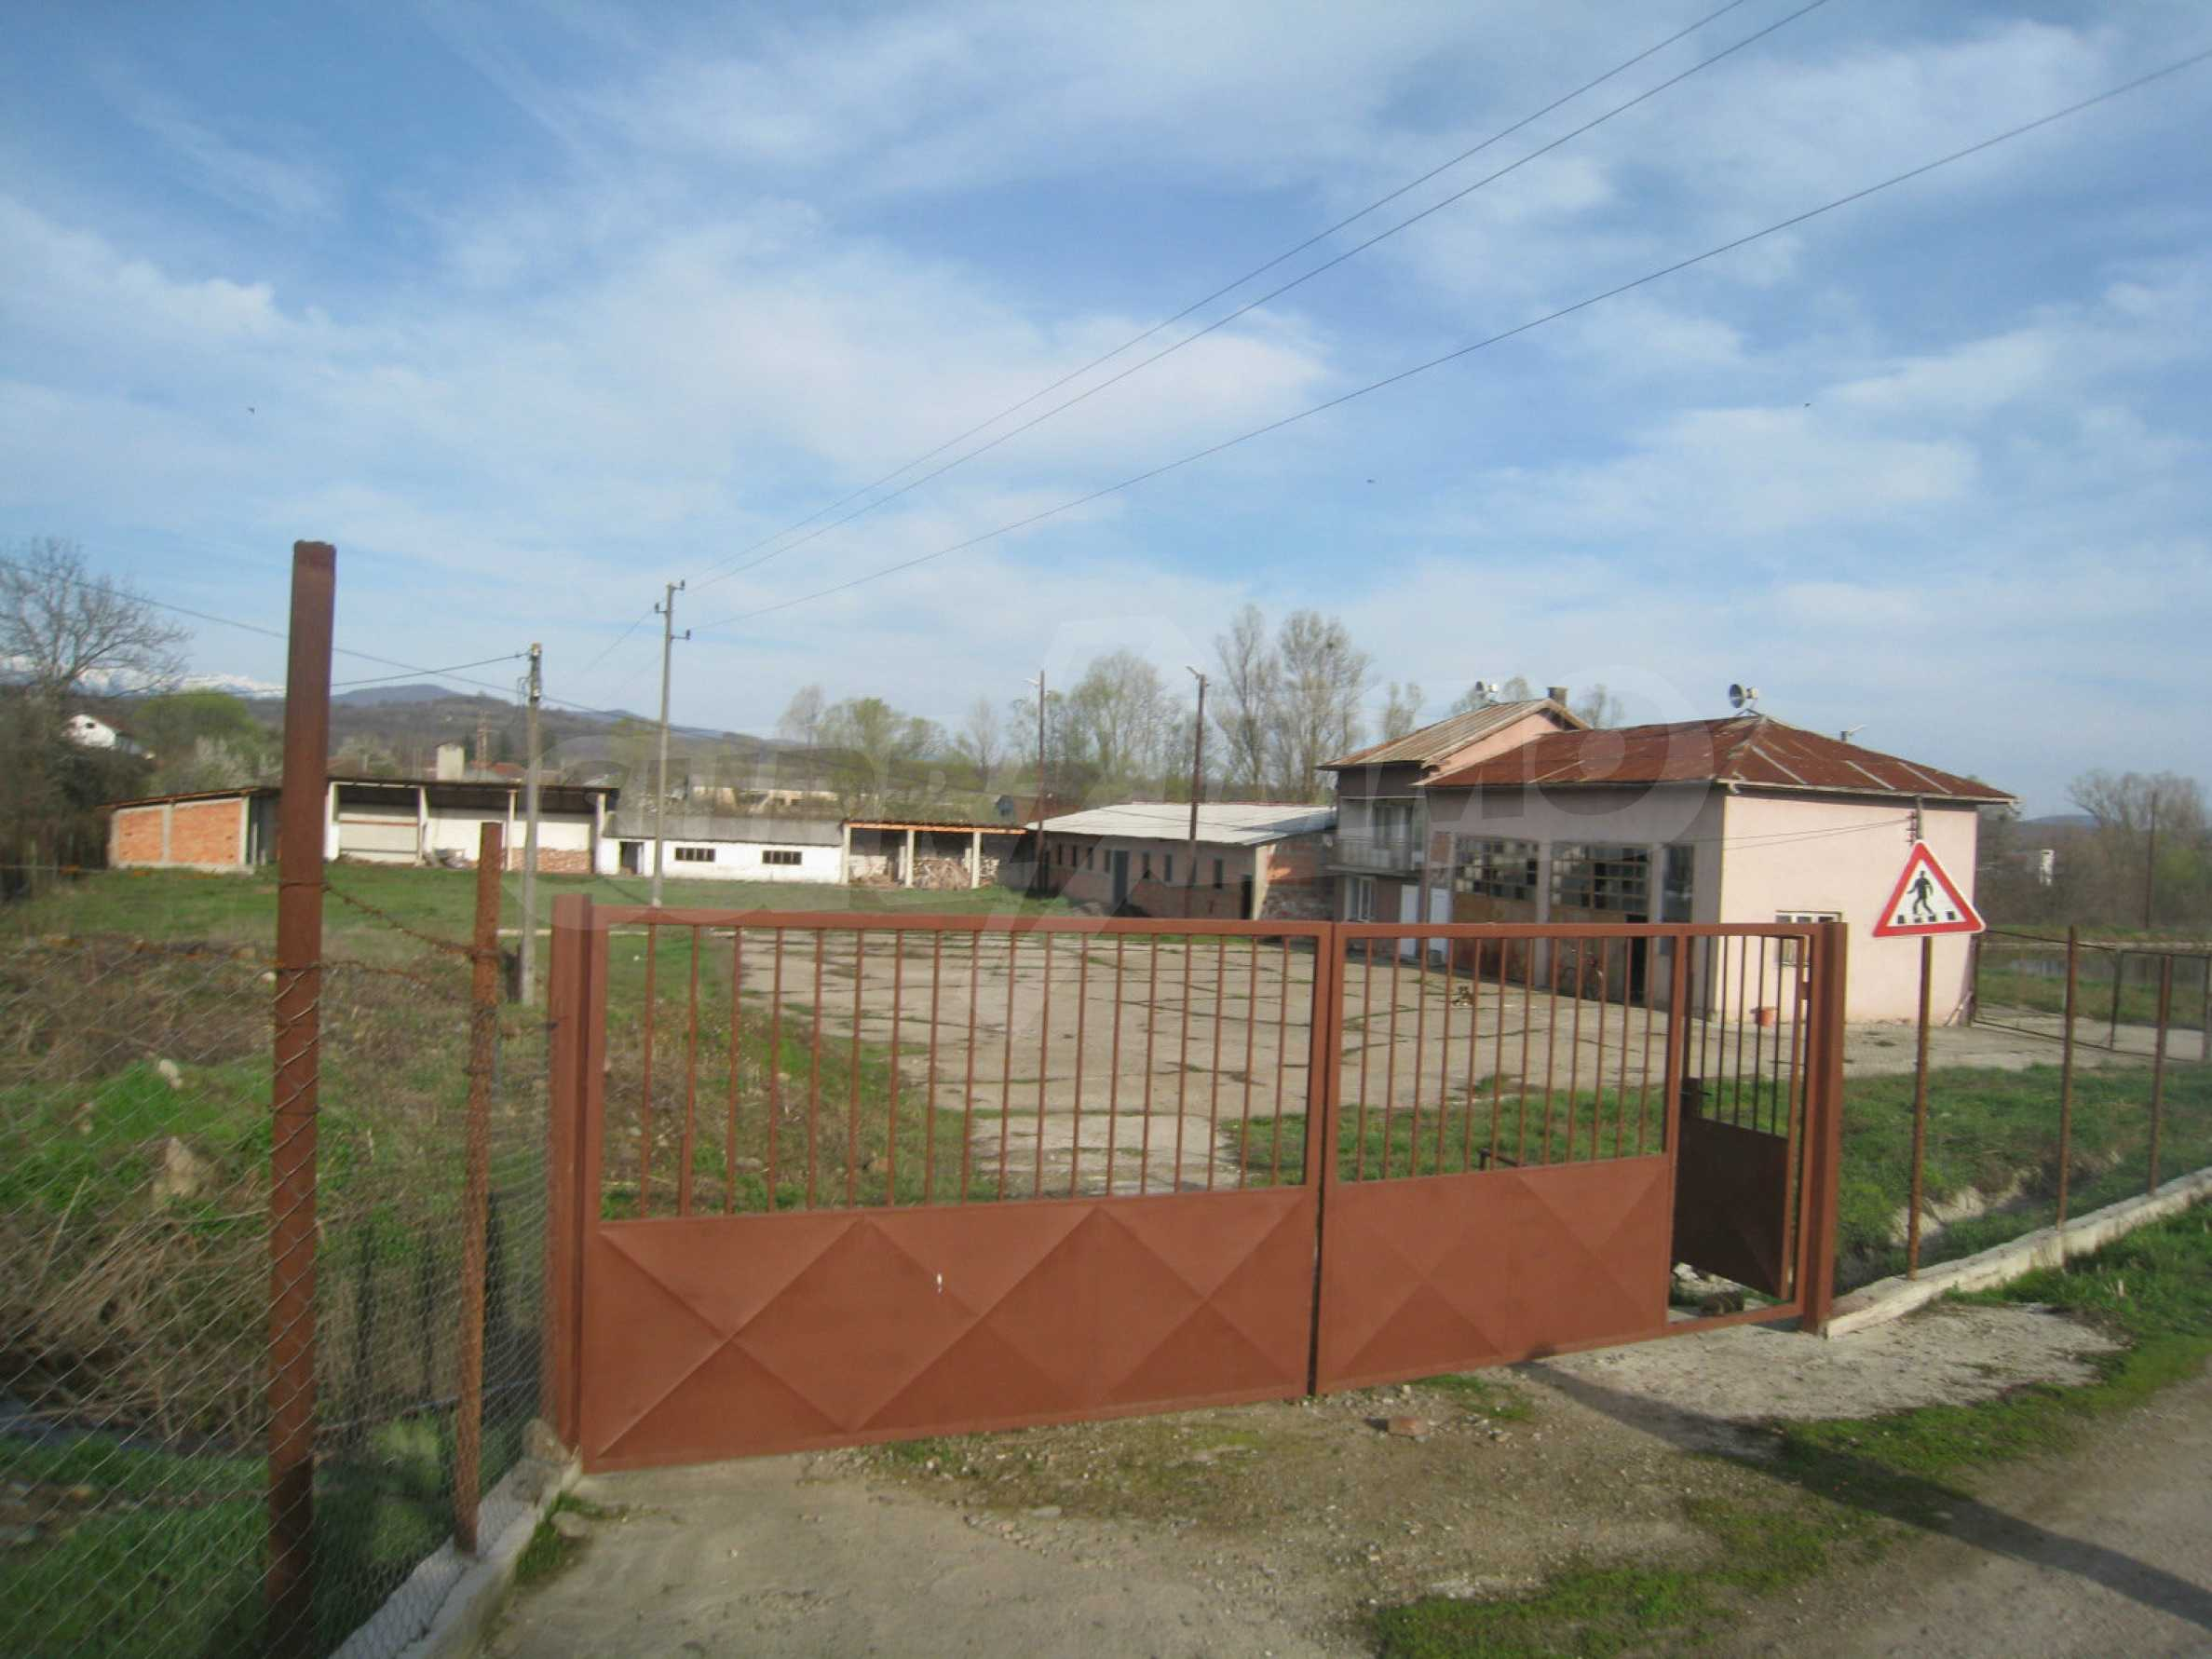 Fishpond, warehouses, residential areas and asphalt ground near Montana 44